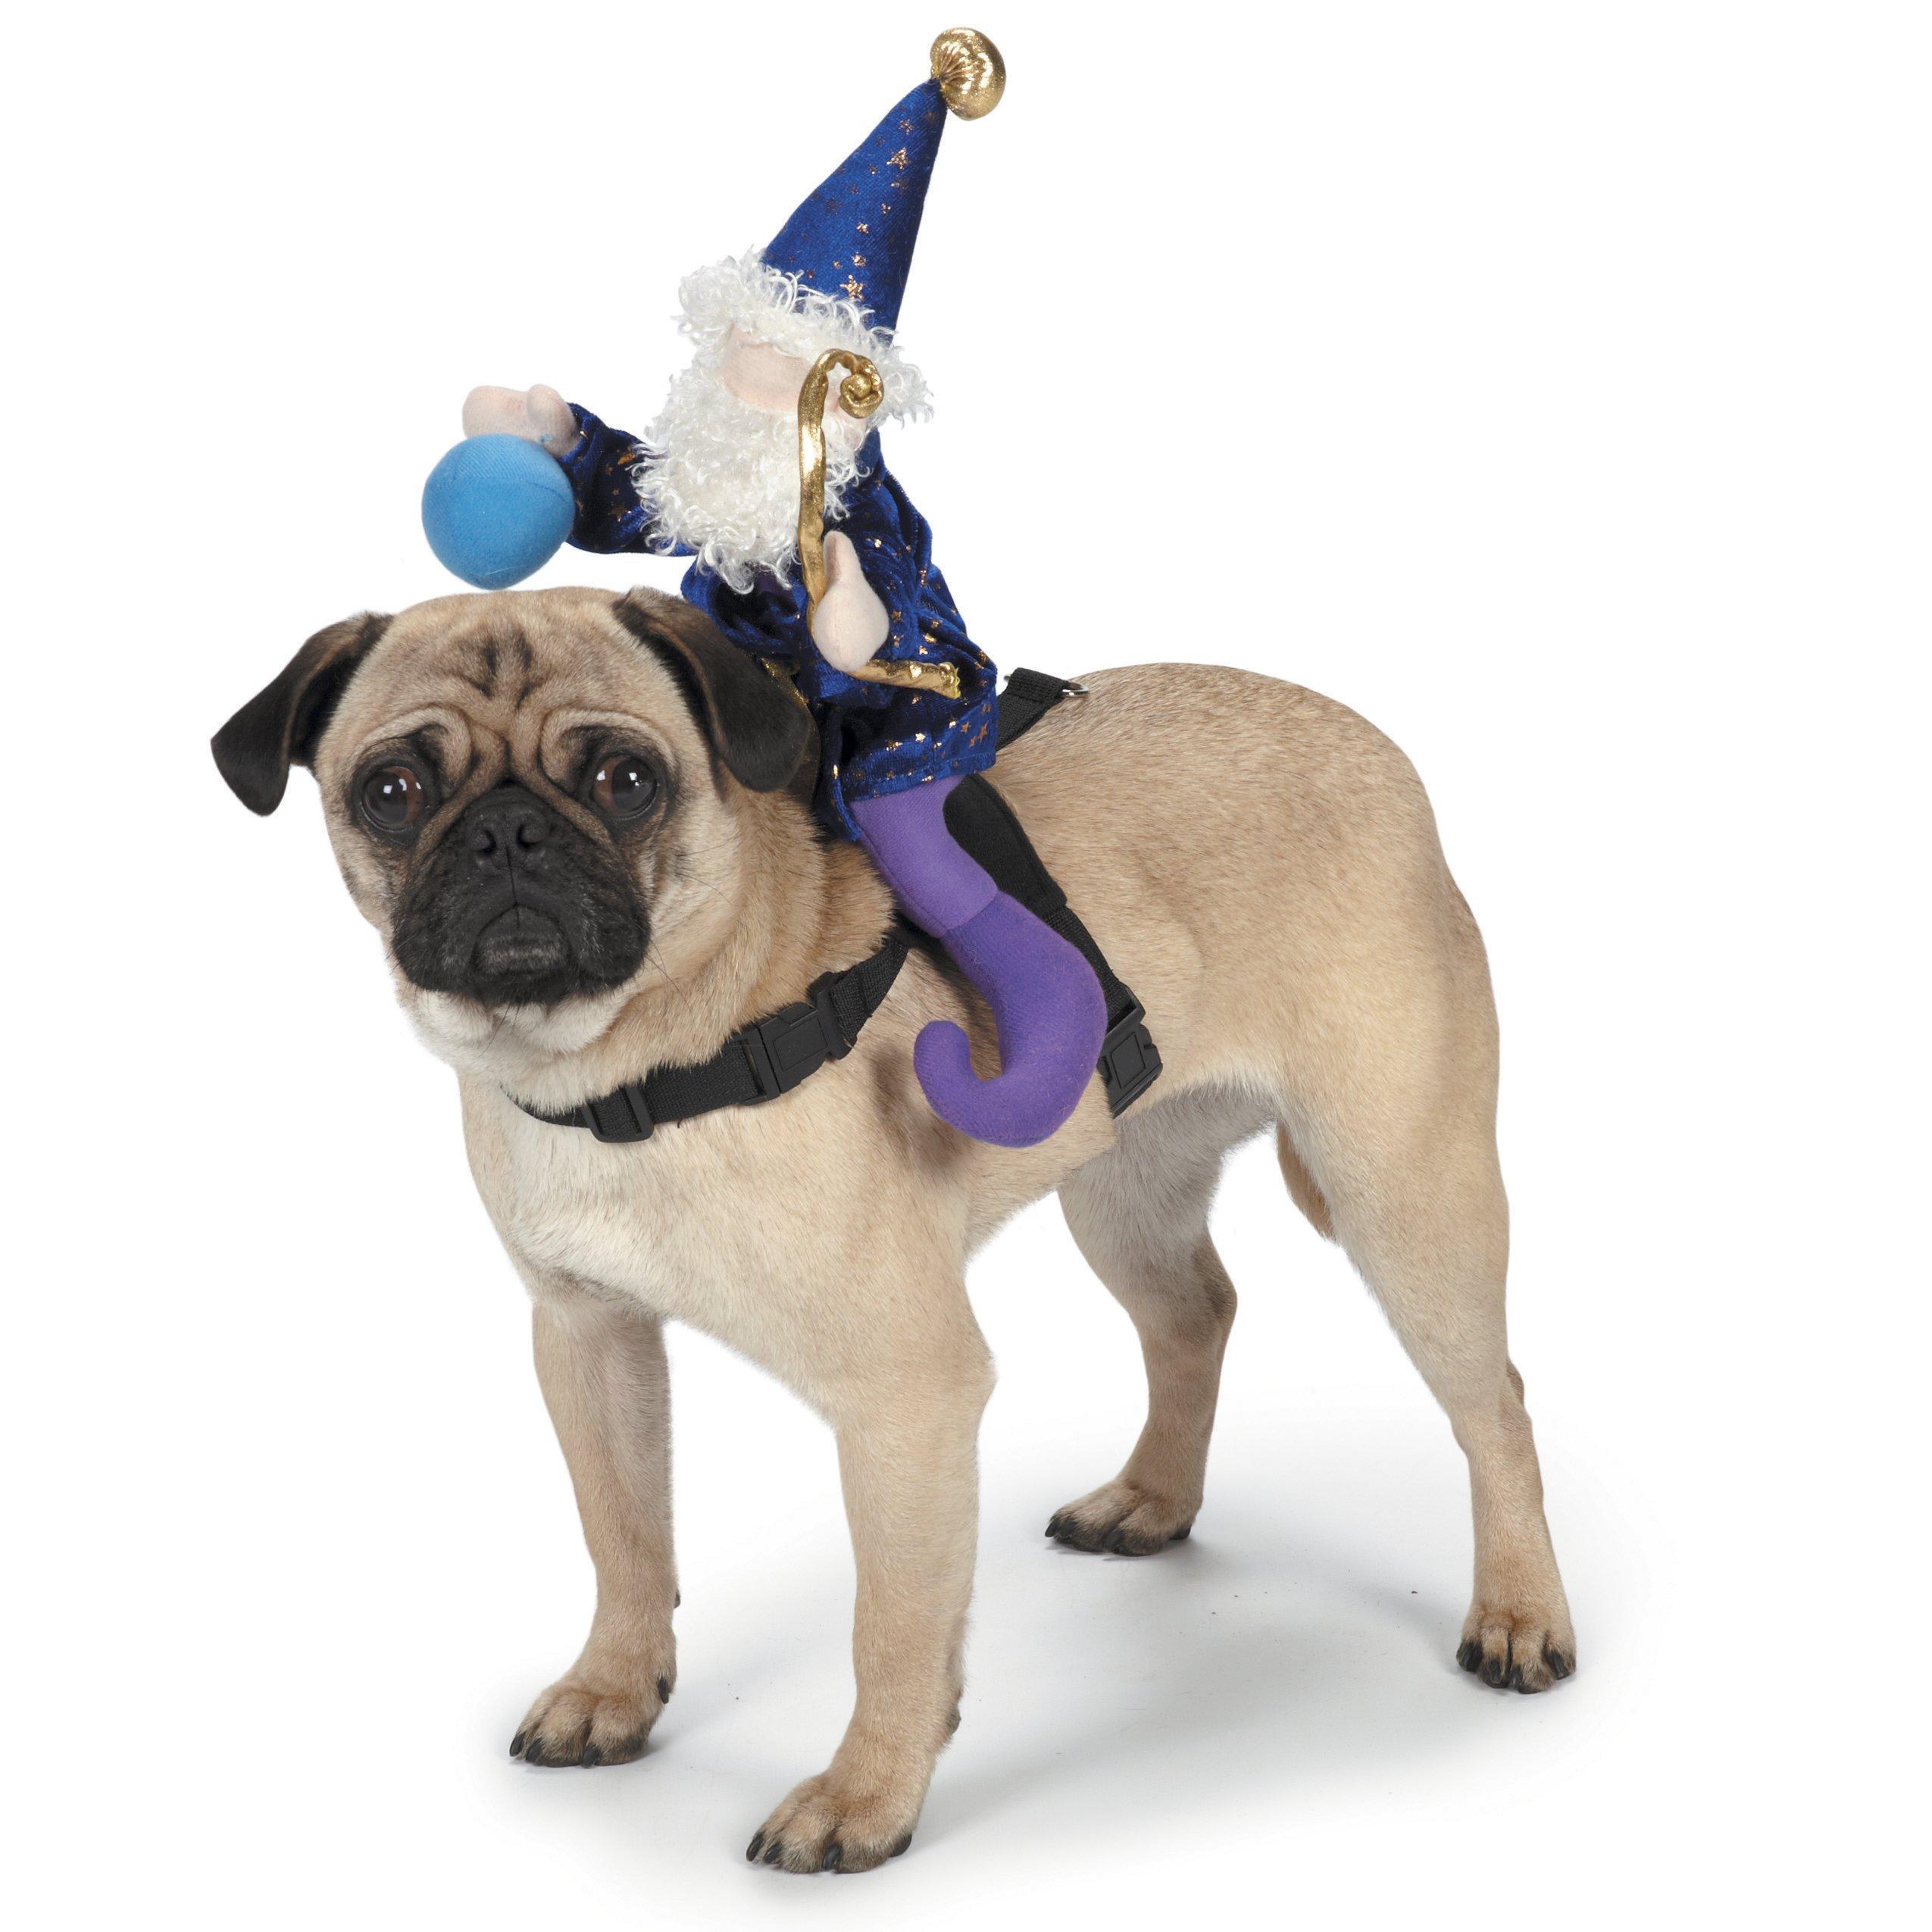 Zack & Zoey Wizard Saddle Dog Costume, Medium by Zack & Zoey